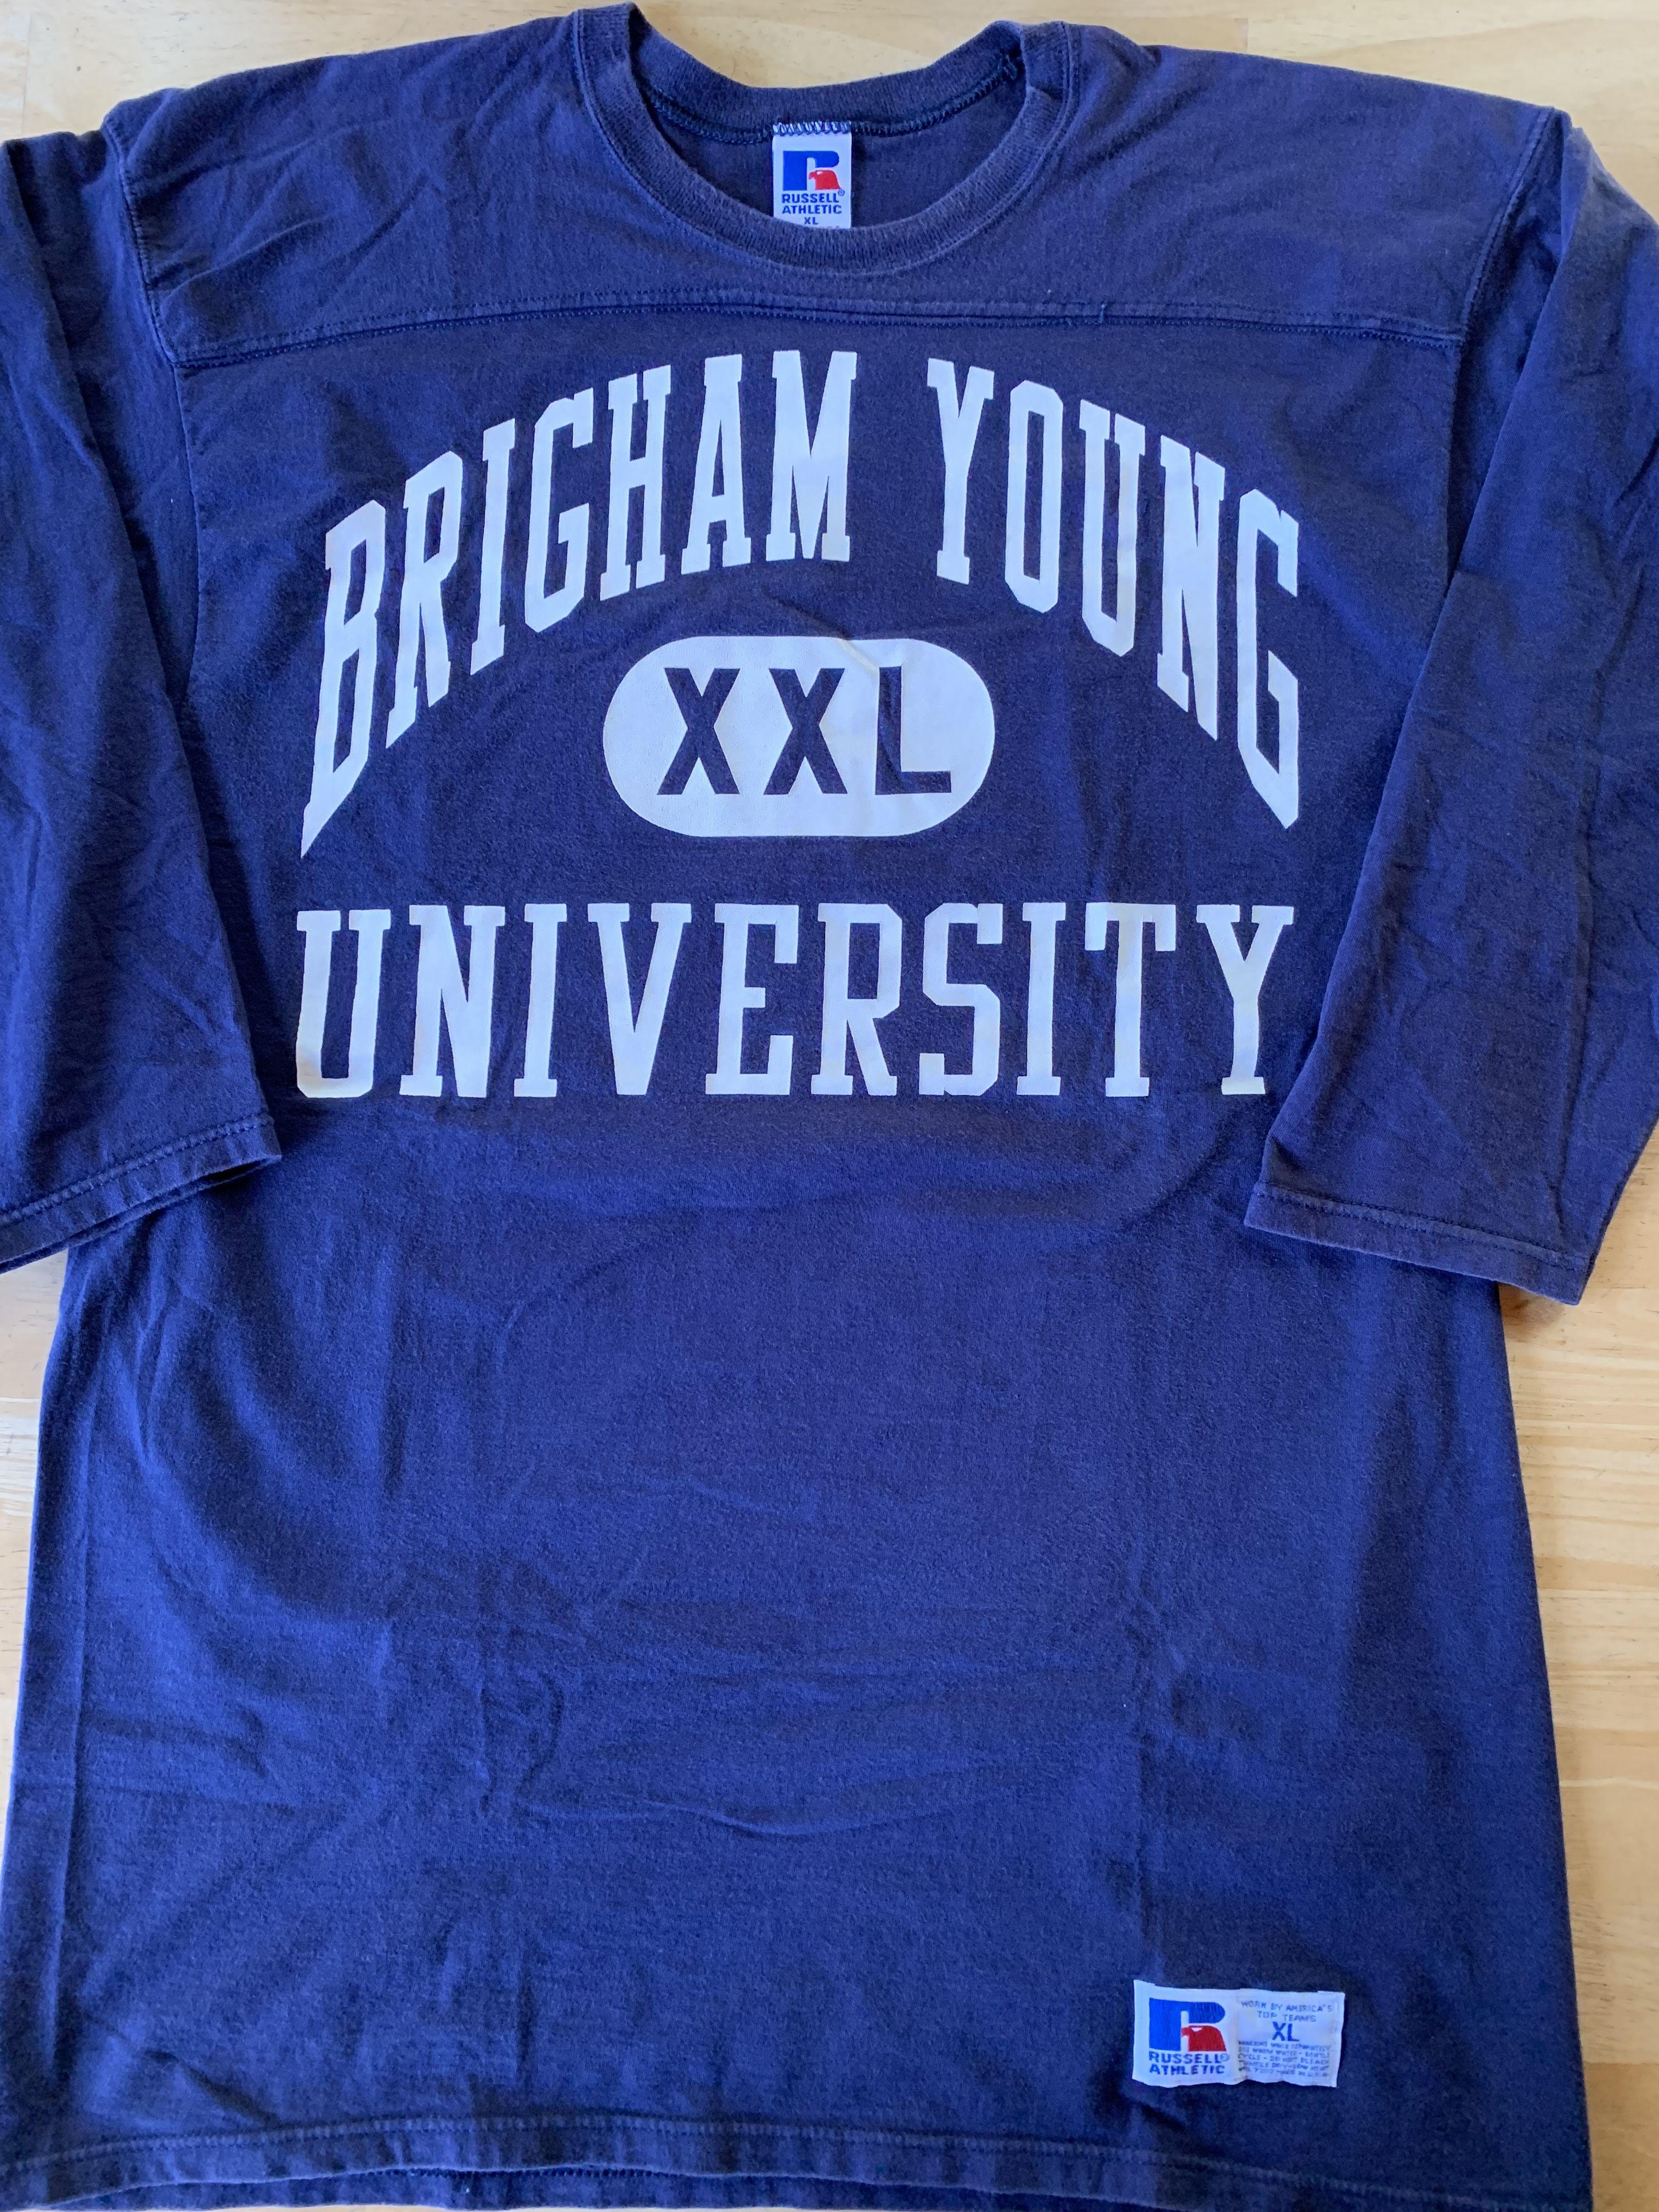 Vintage T Shirt In 2020 Vintage Tshirts Vintage Clothing Men Long Sleeve Tshirt Men